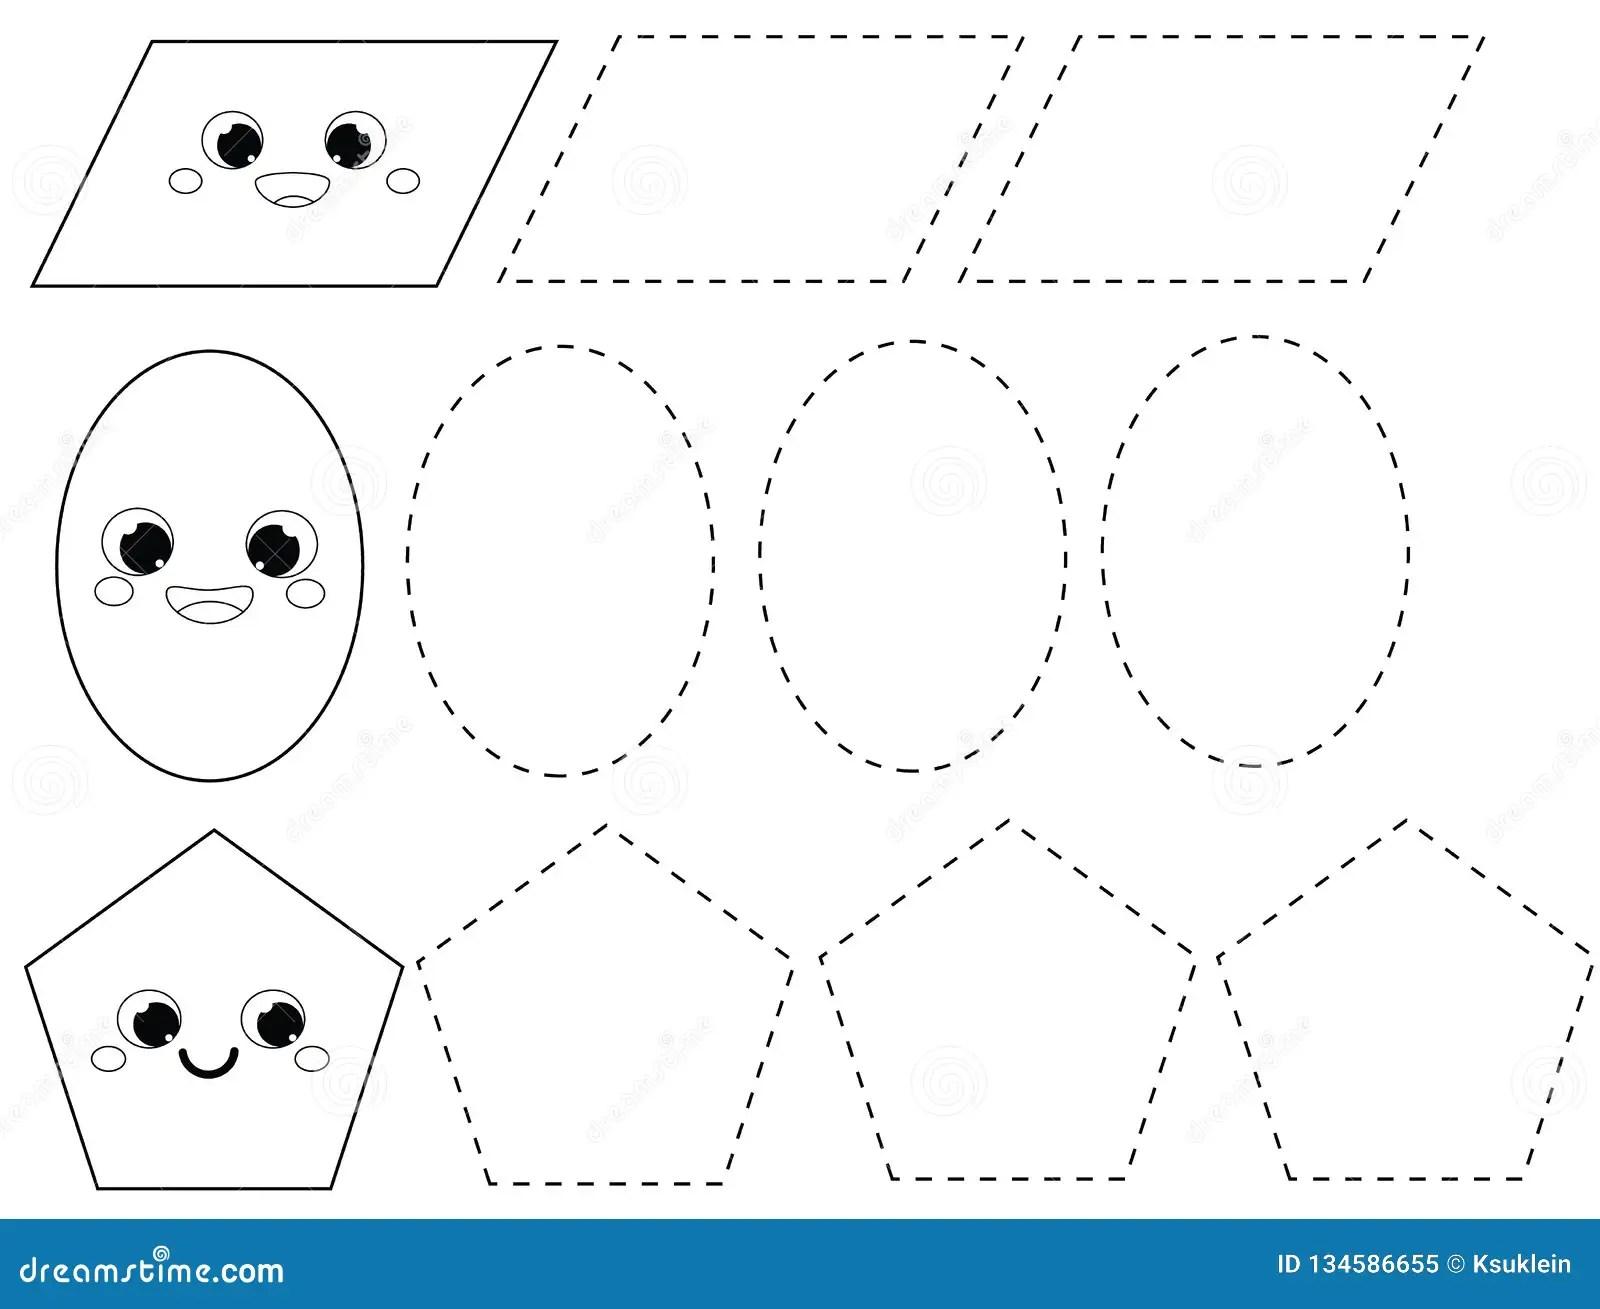 Handwriting Practice Sheet Educational Children Game Printable Worksheet For Kids Tracing